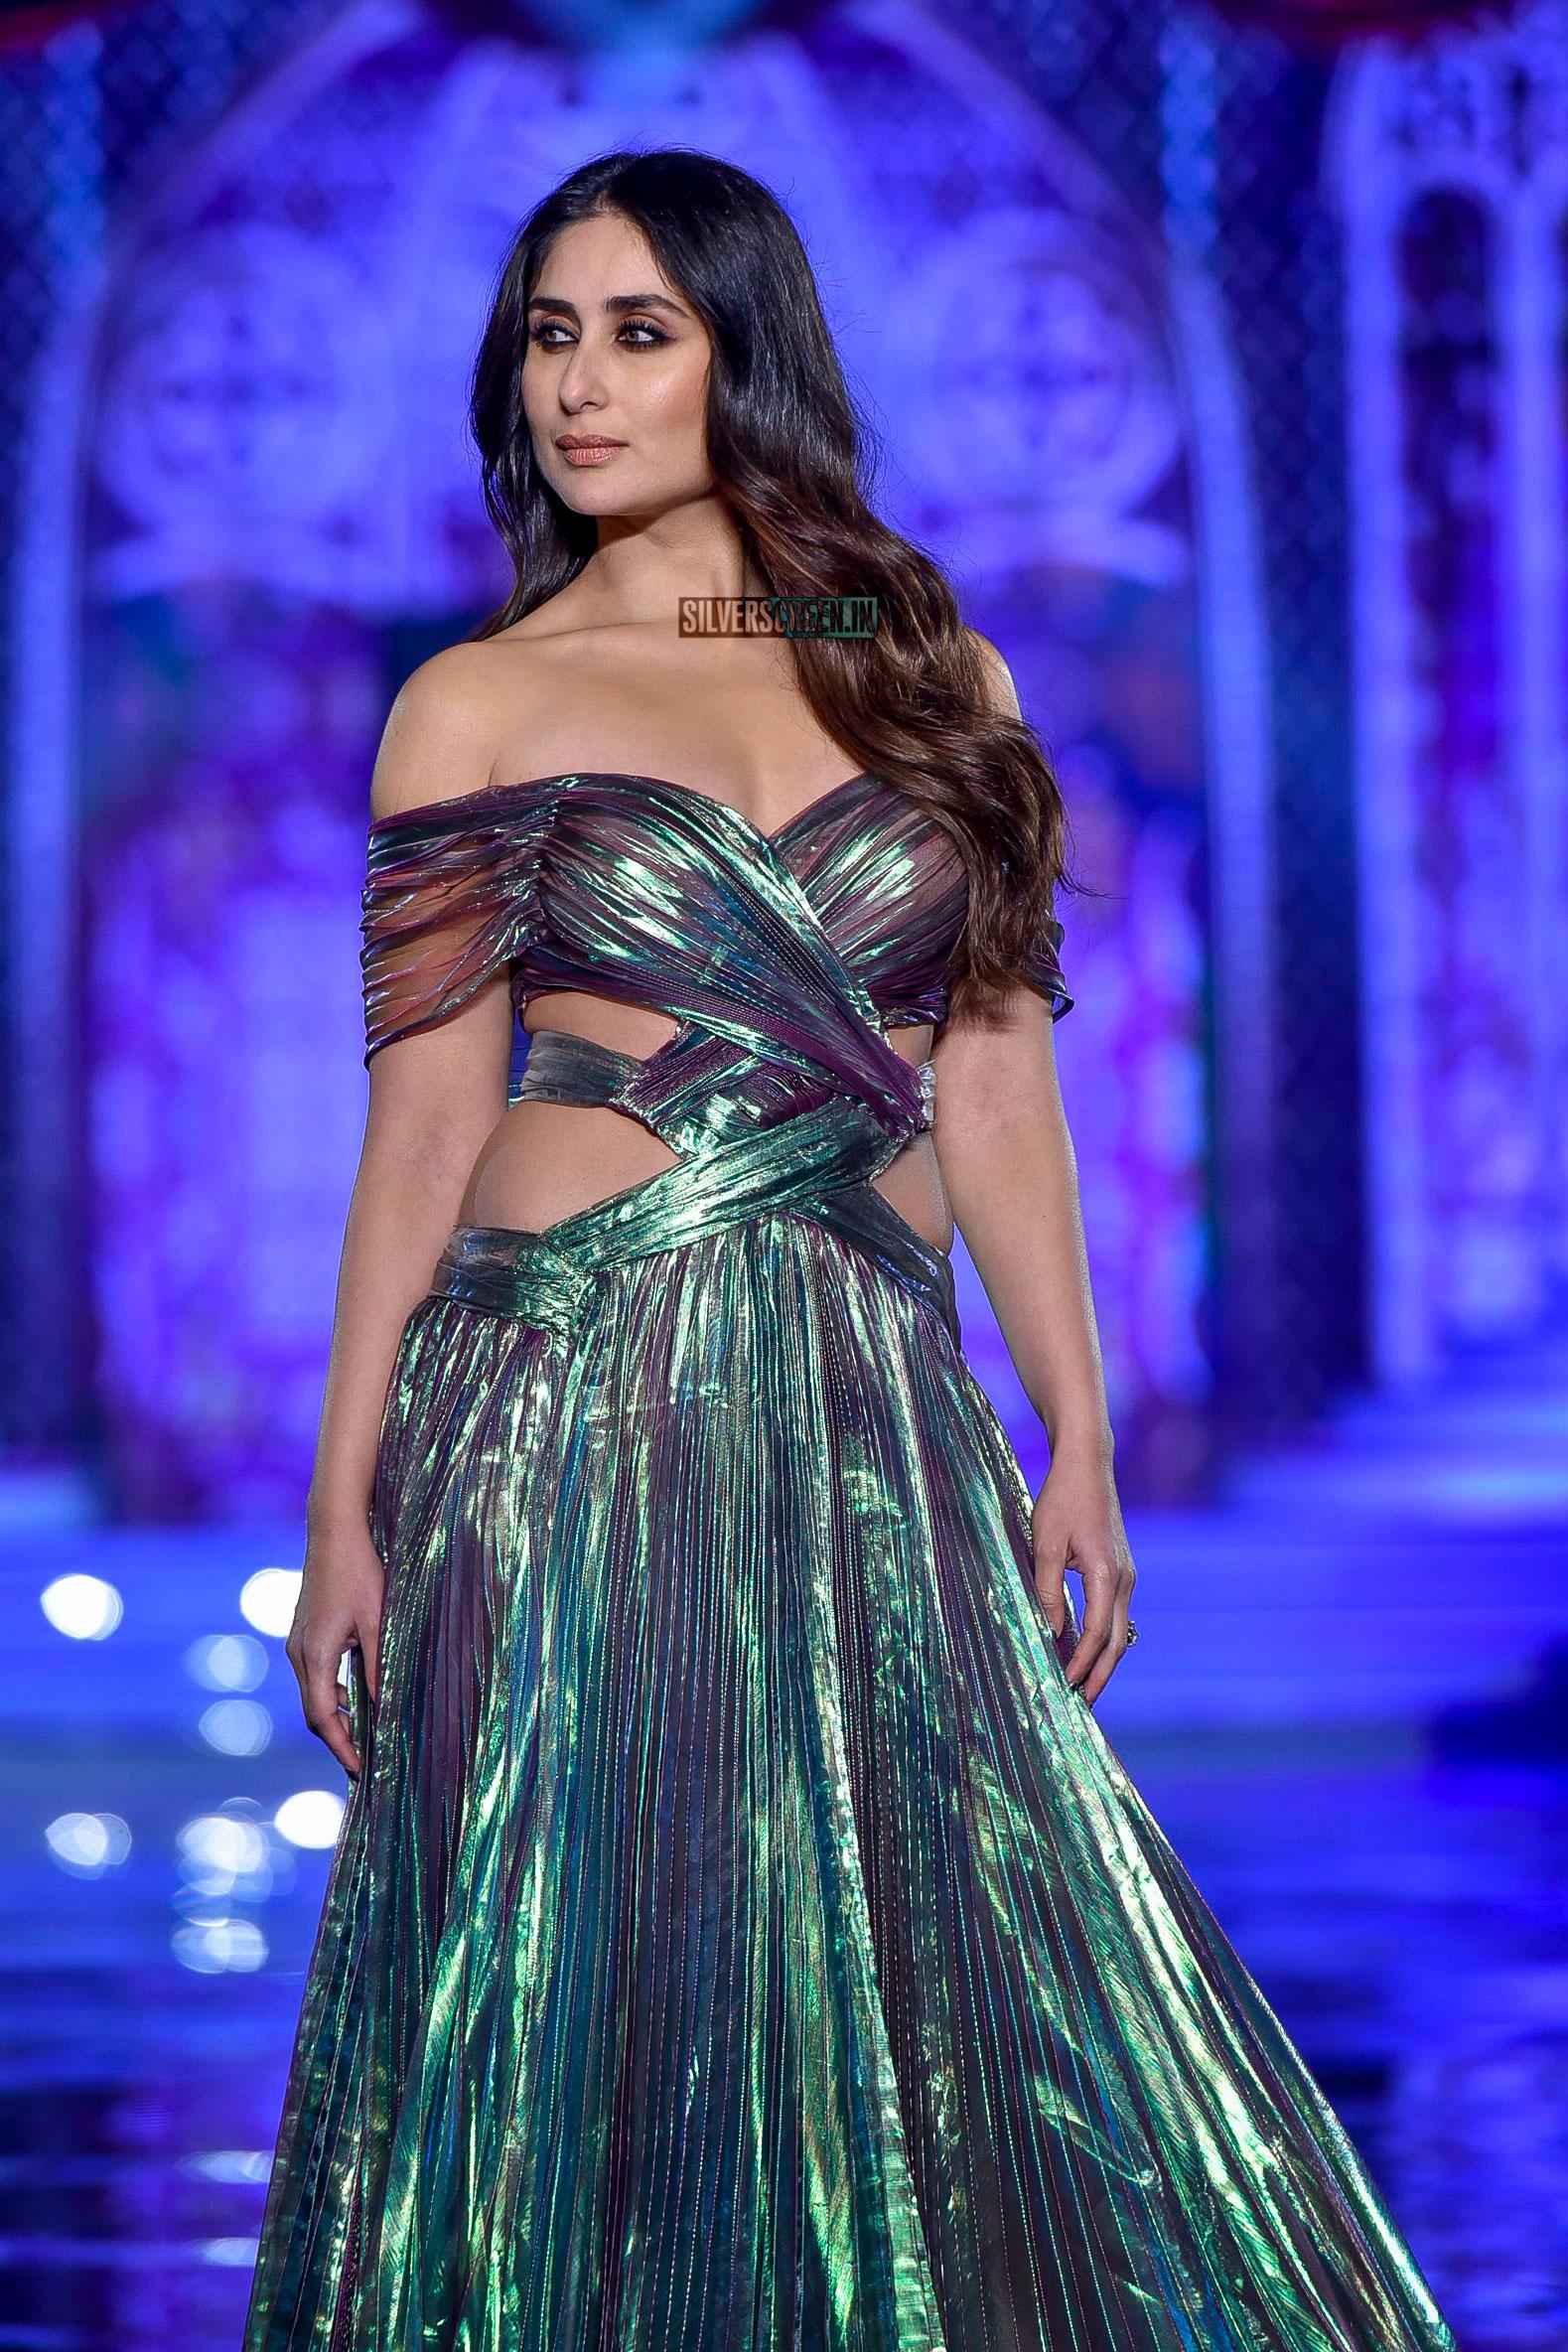 Reviews >> Kareena Kapoor, Kriti Kharbanda At The Lakme Fashion Week 2018 | Silverscreen.in